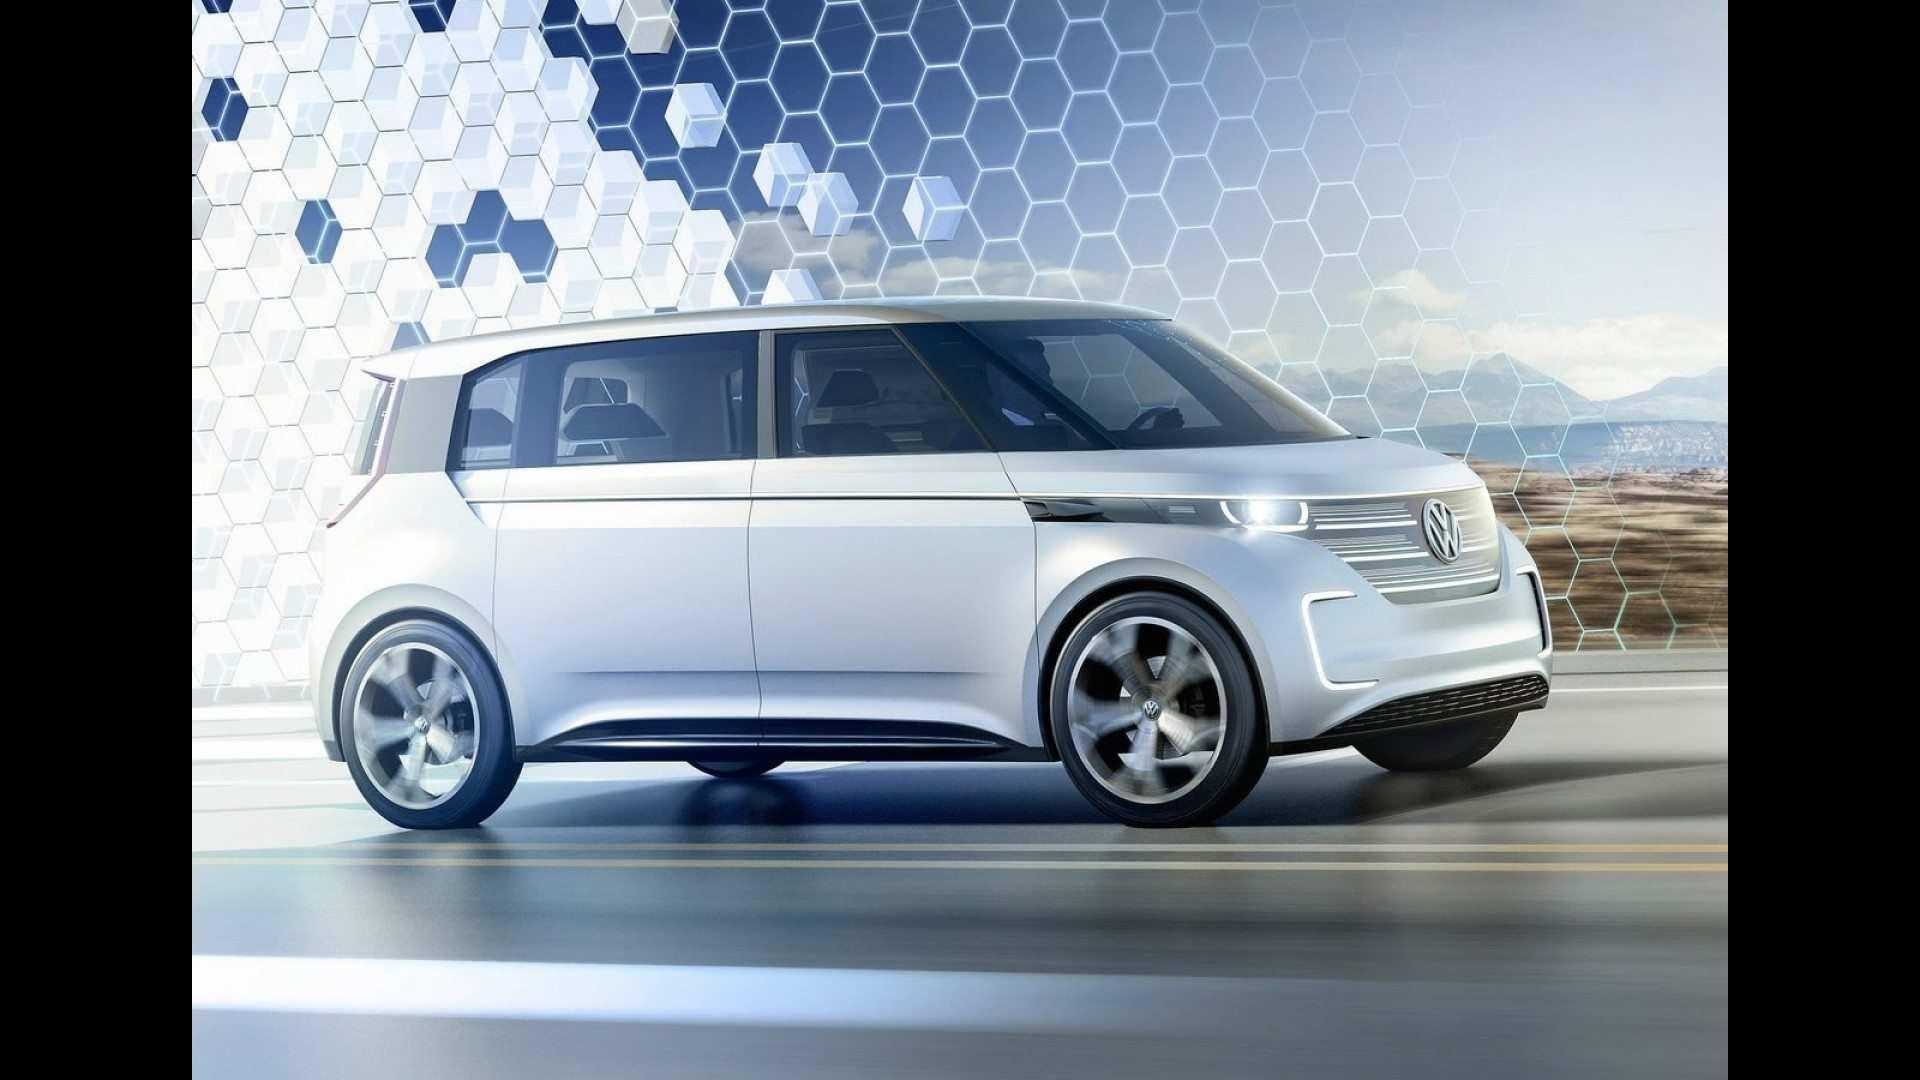 74 New VW Kombi 2020 Configurations for VW Kombi 2020